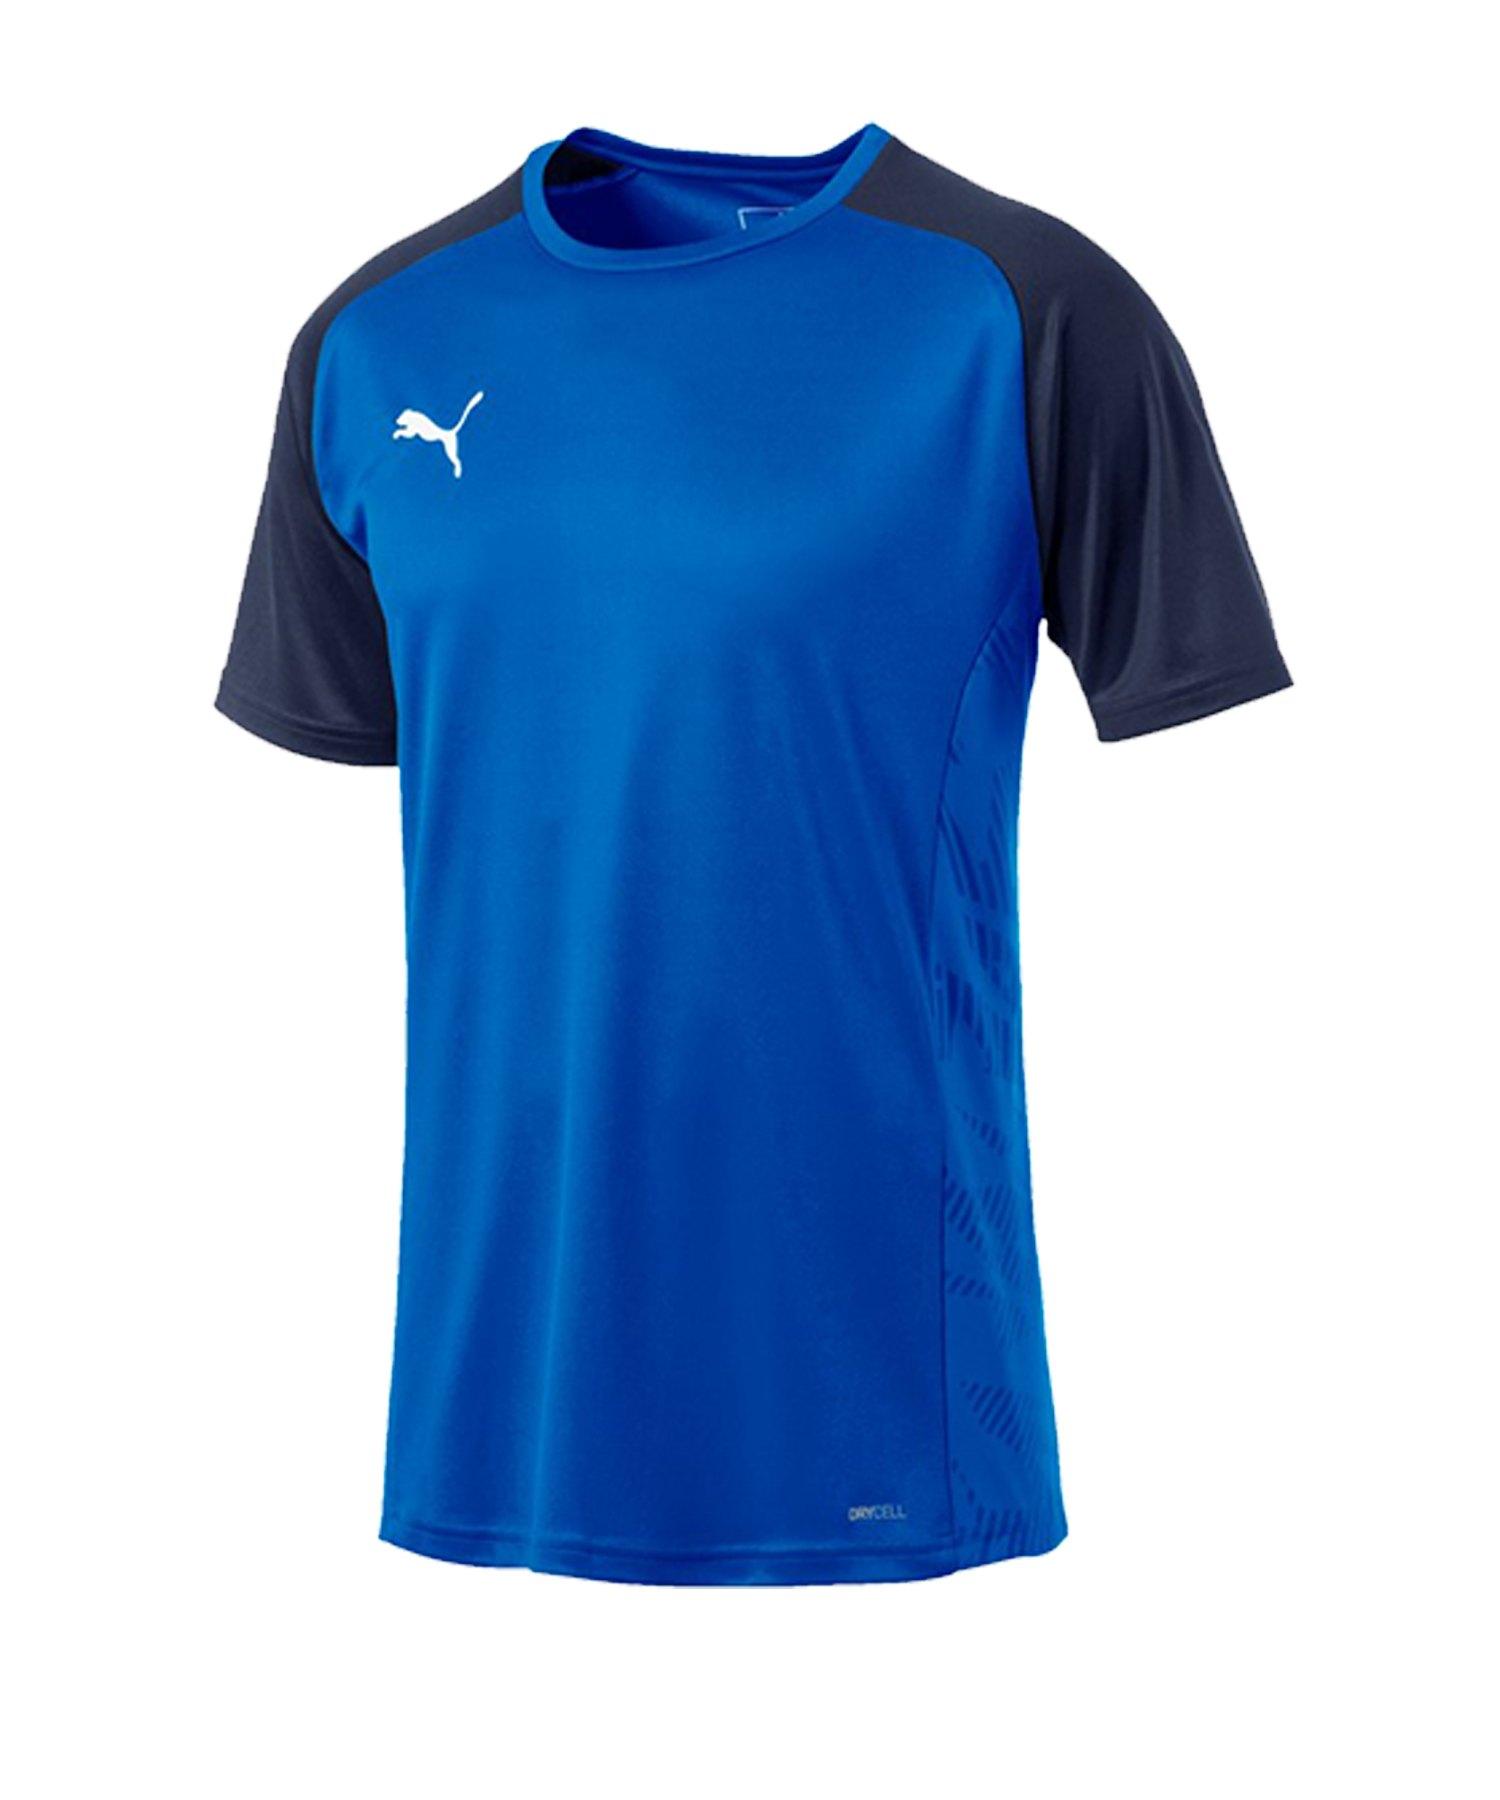 PUMA CUP Sideline Core T-Shirt Blau F02 - blau